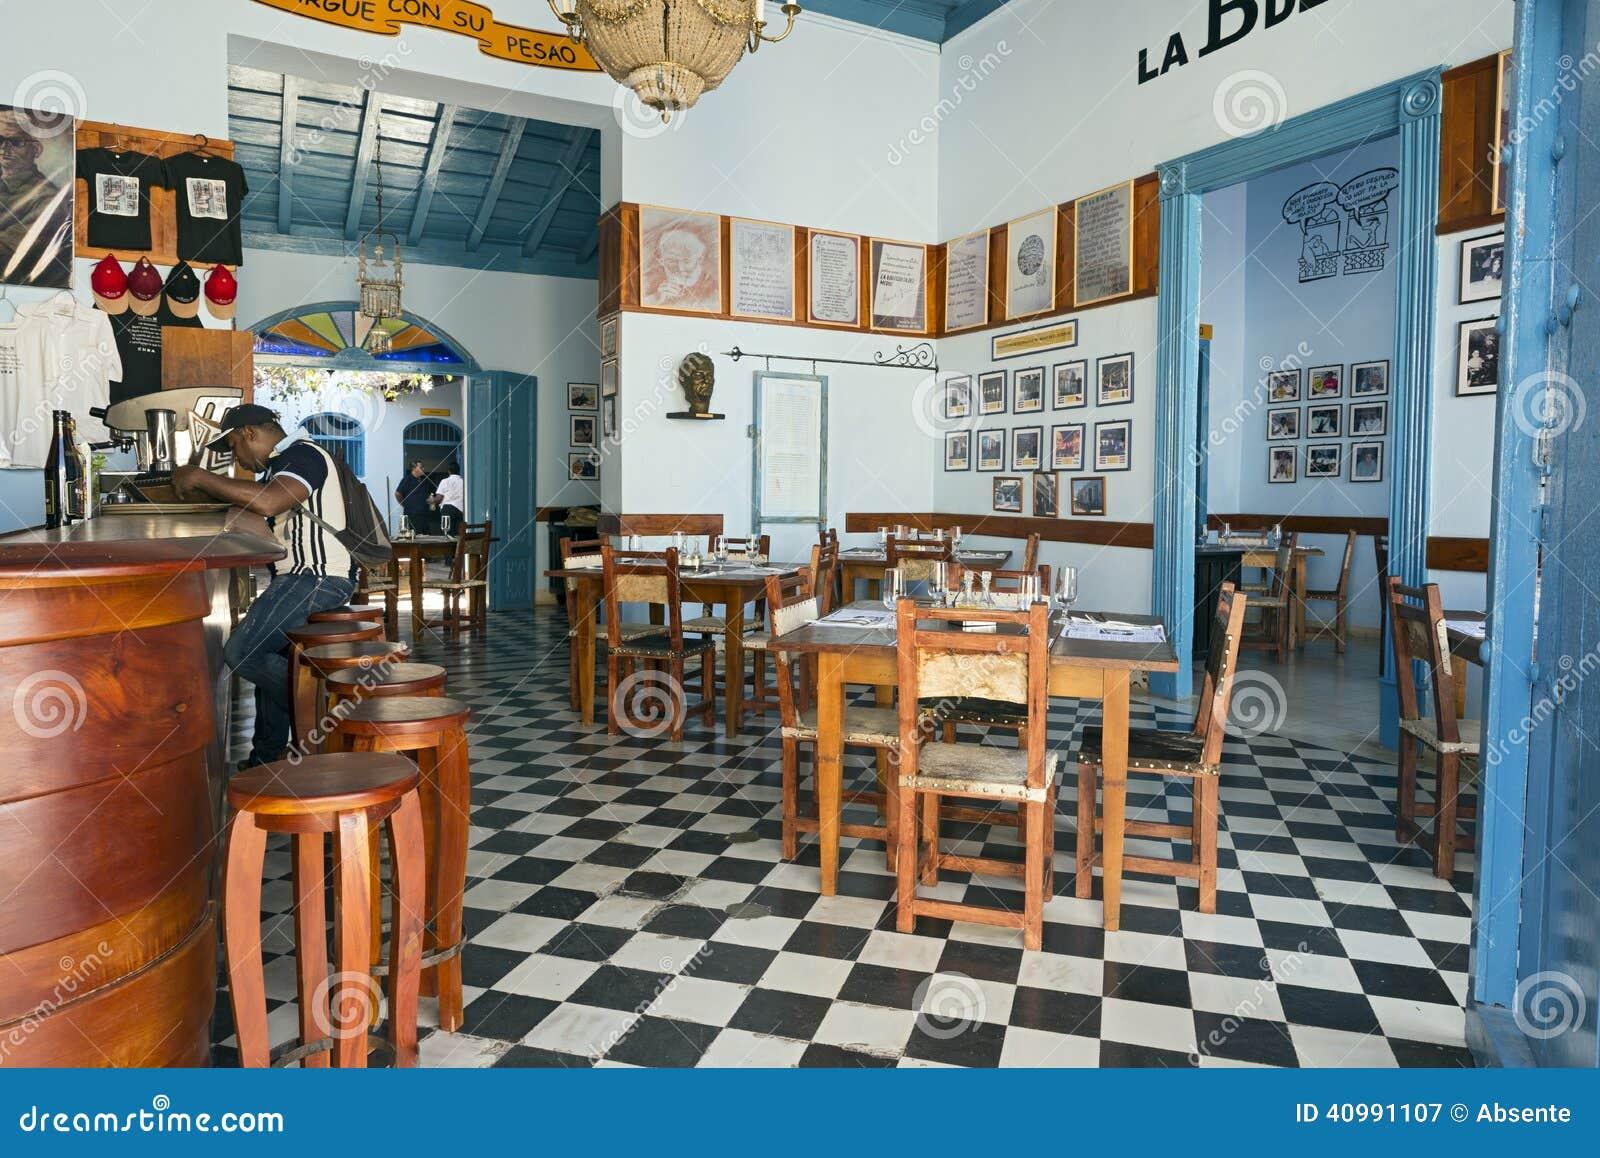 Trinidad cuba editorial photography for Design hotel kuba